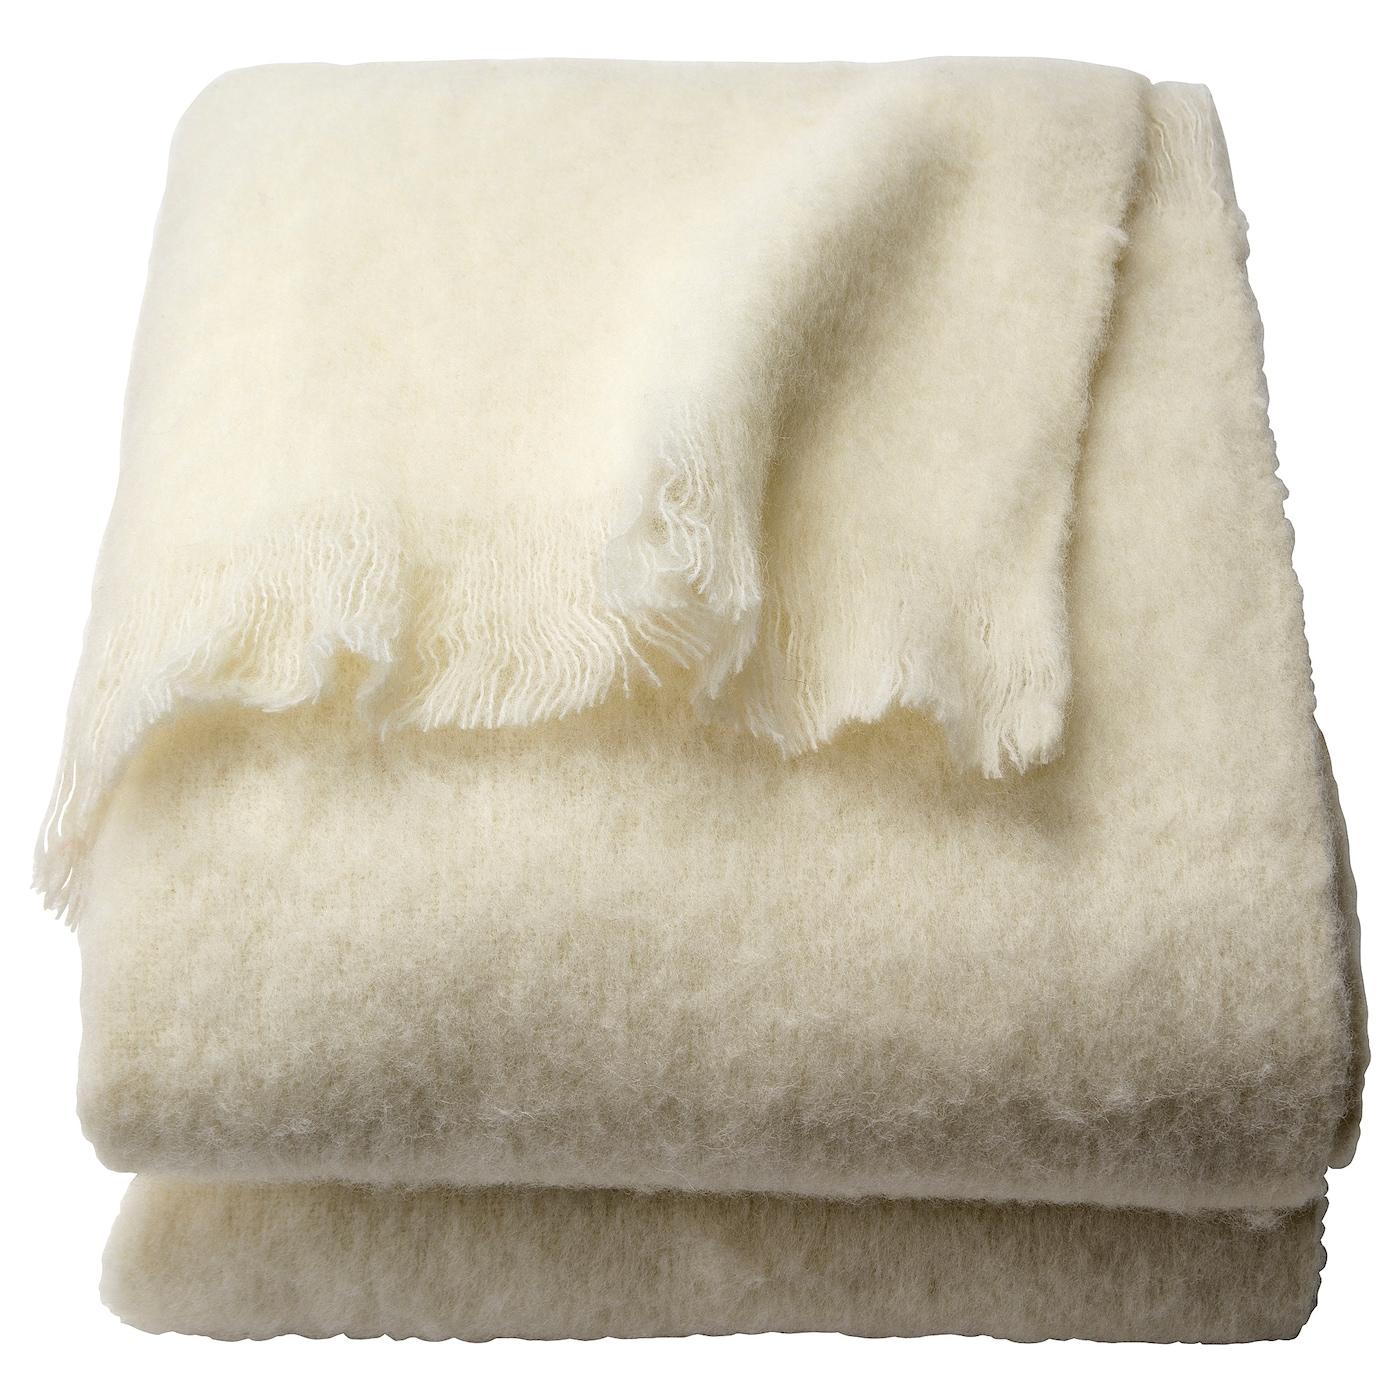 anncharlotte plaid blanc 120 x 180 cm ikea. Black Bedroom Furniture Sets. Home Design Ideas